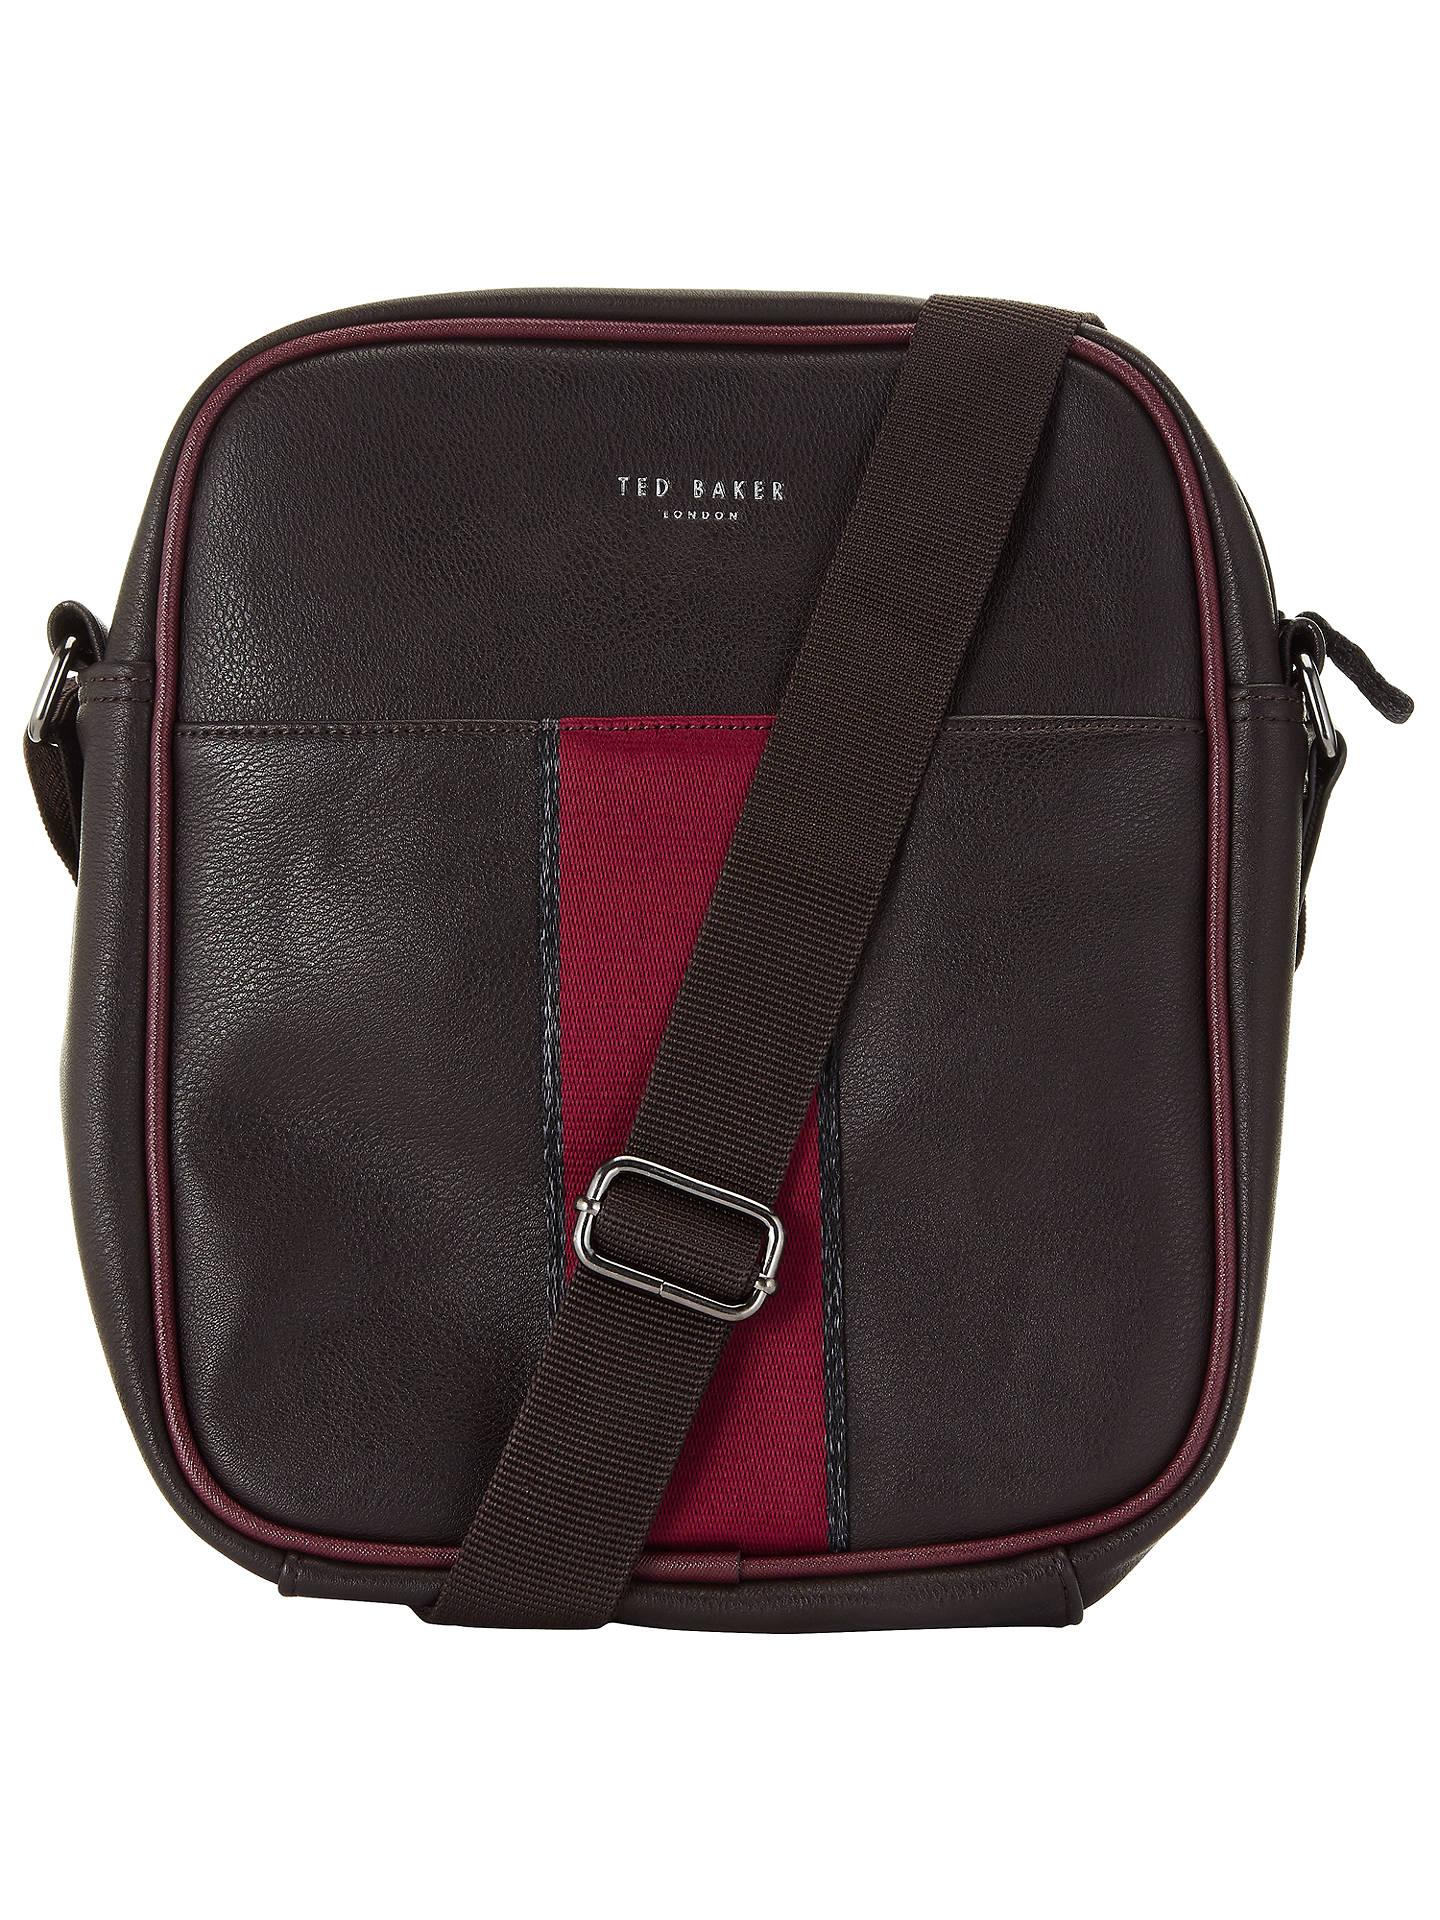 e3ee5310ade1 Buy Ted Baker Kennedy Webbing Flight Bag, Chocolate Online at johnlewis.com  ...